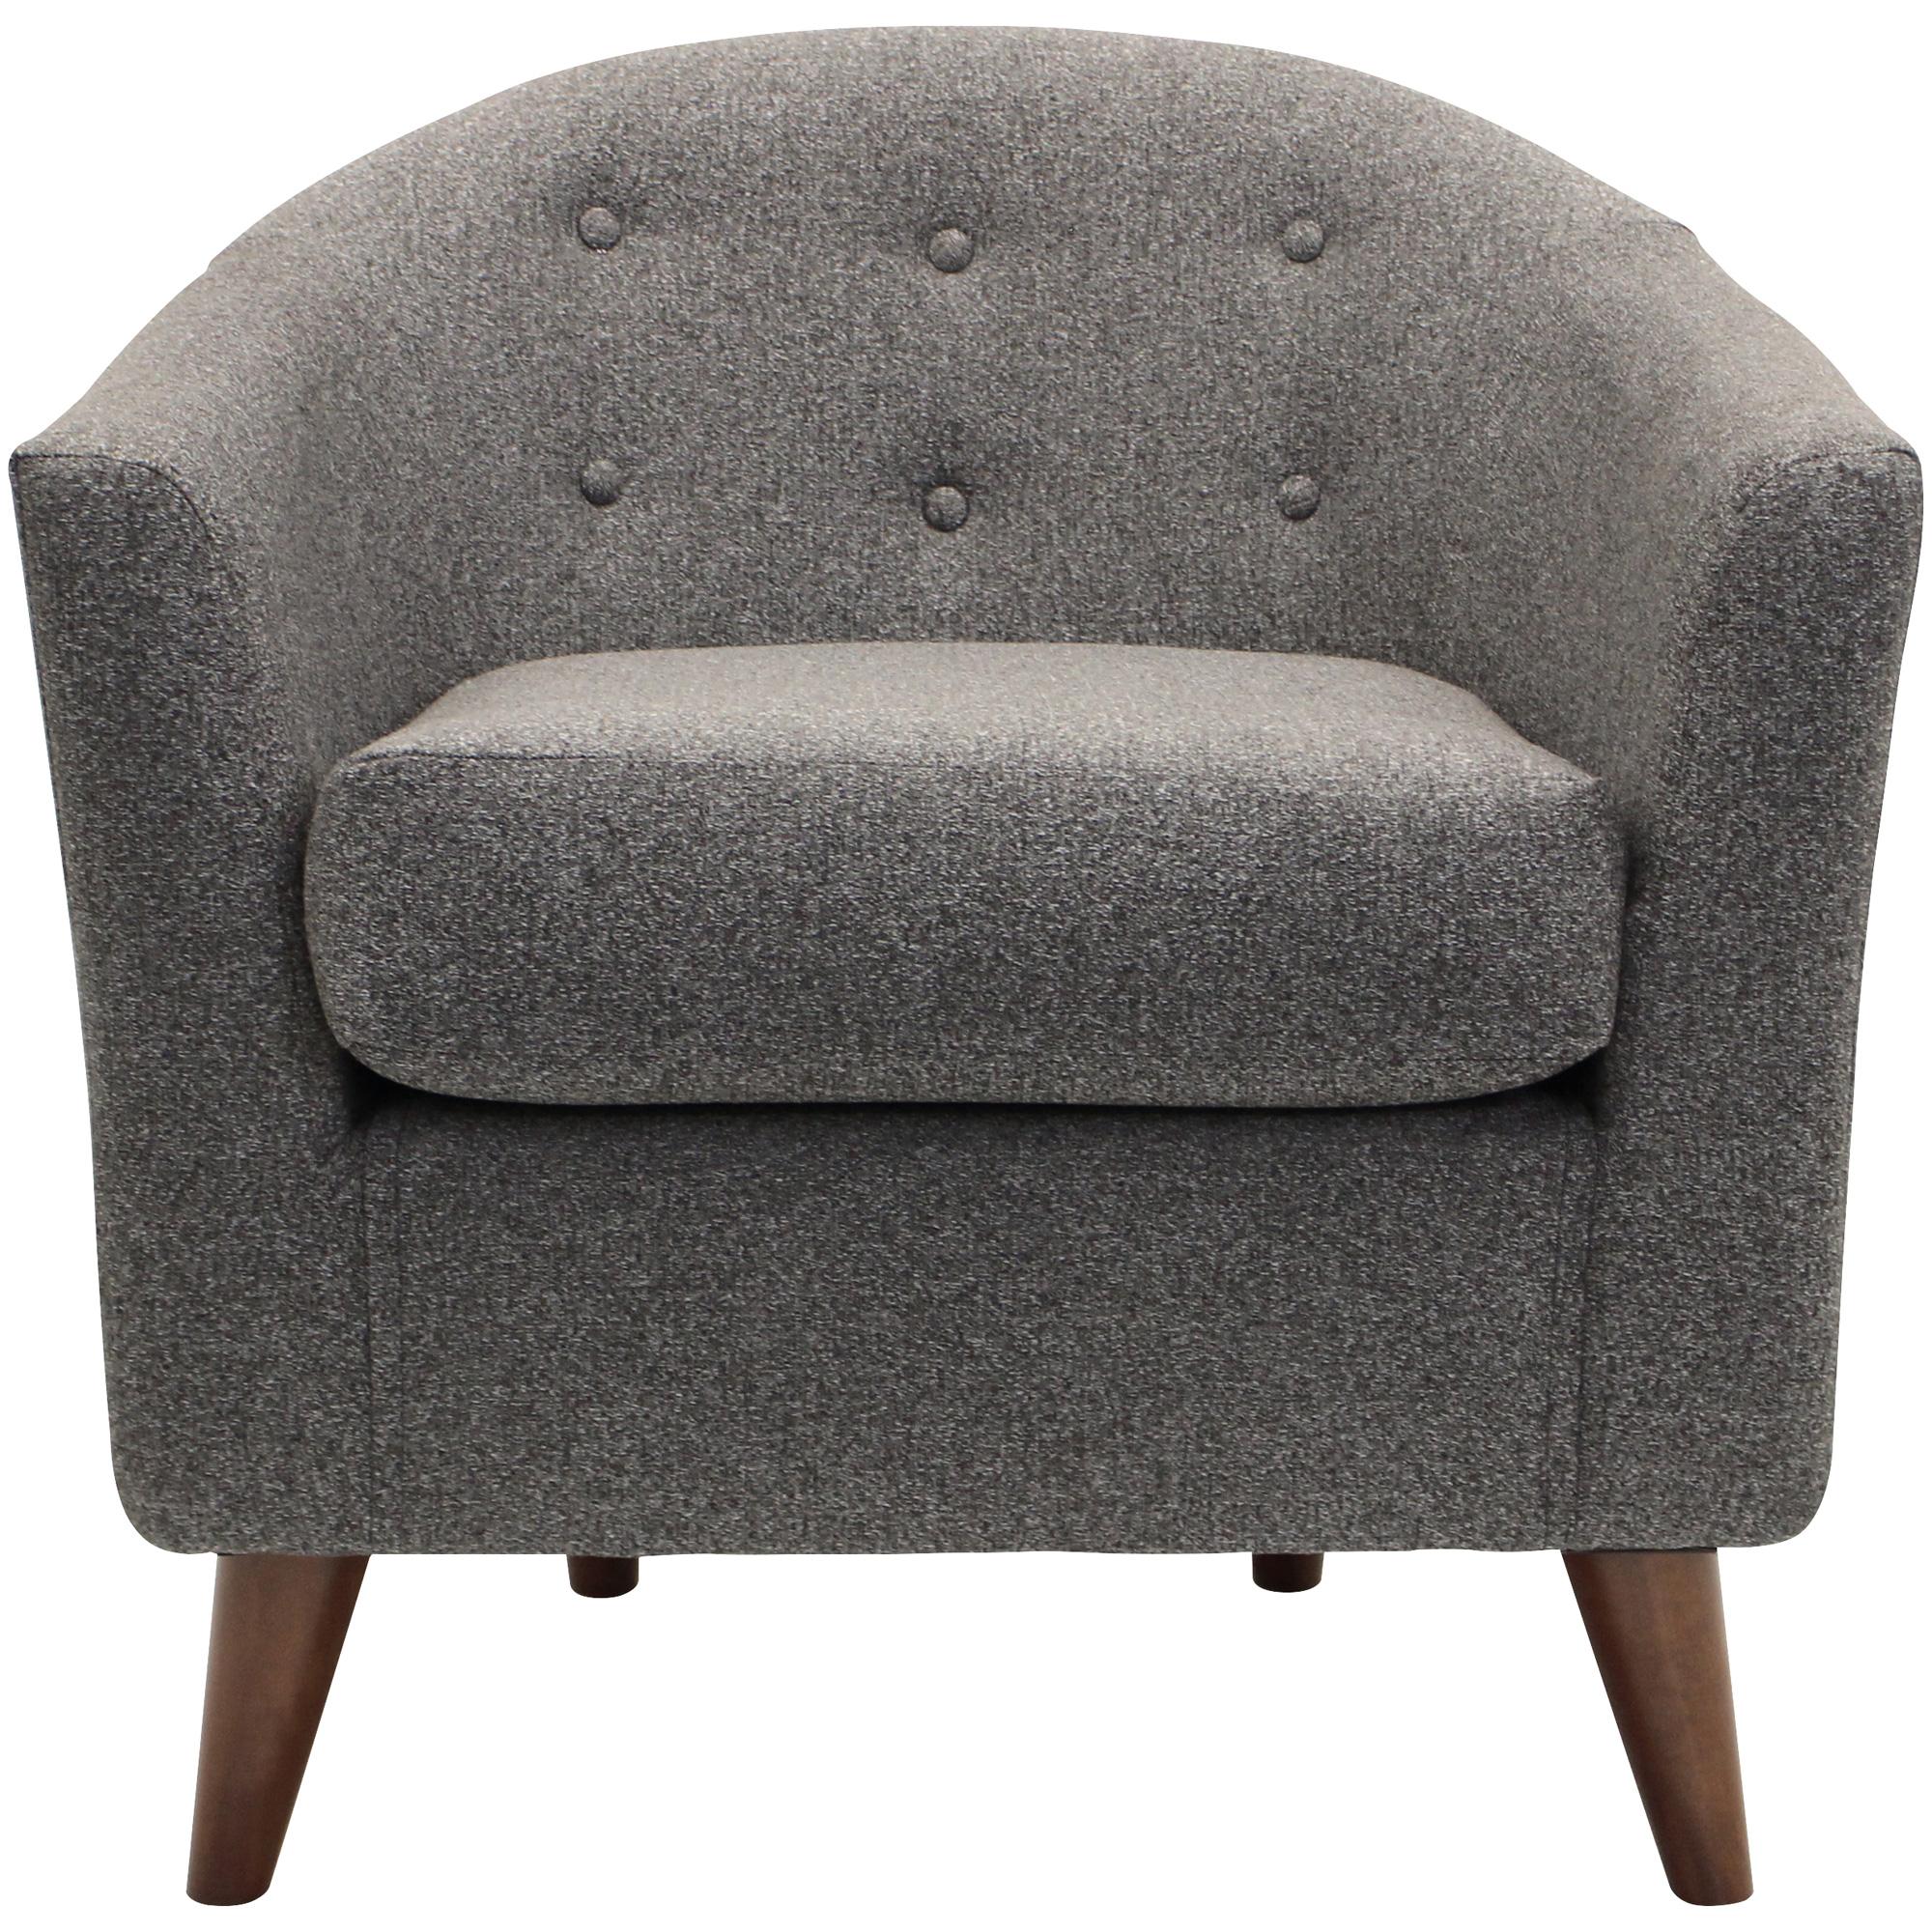 Overman | Marissa Granite Accent Chair